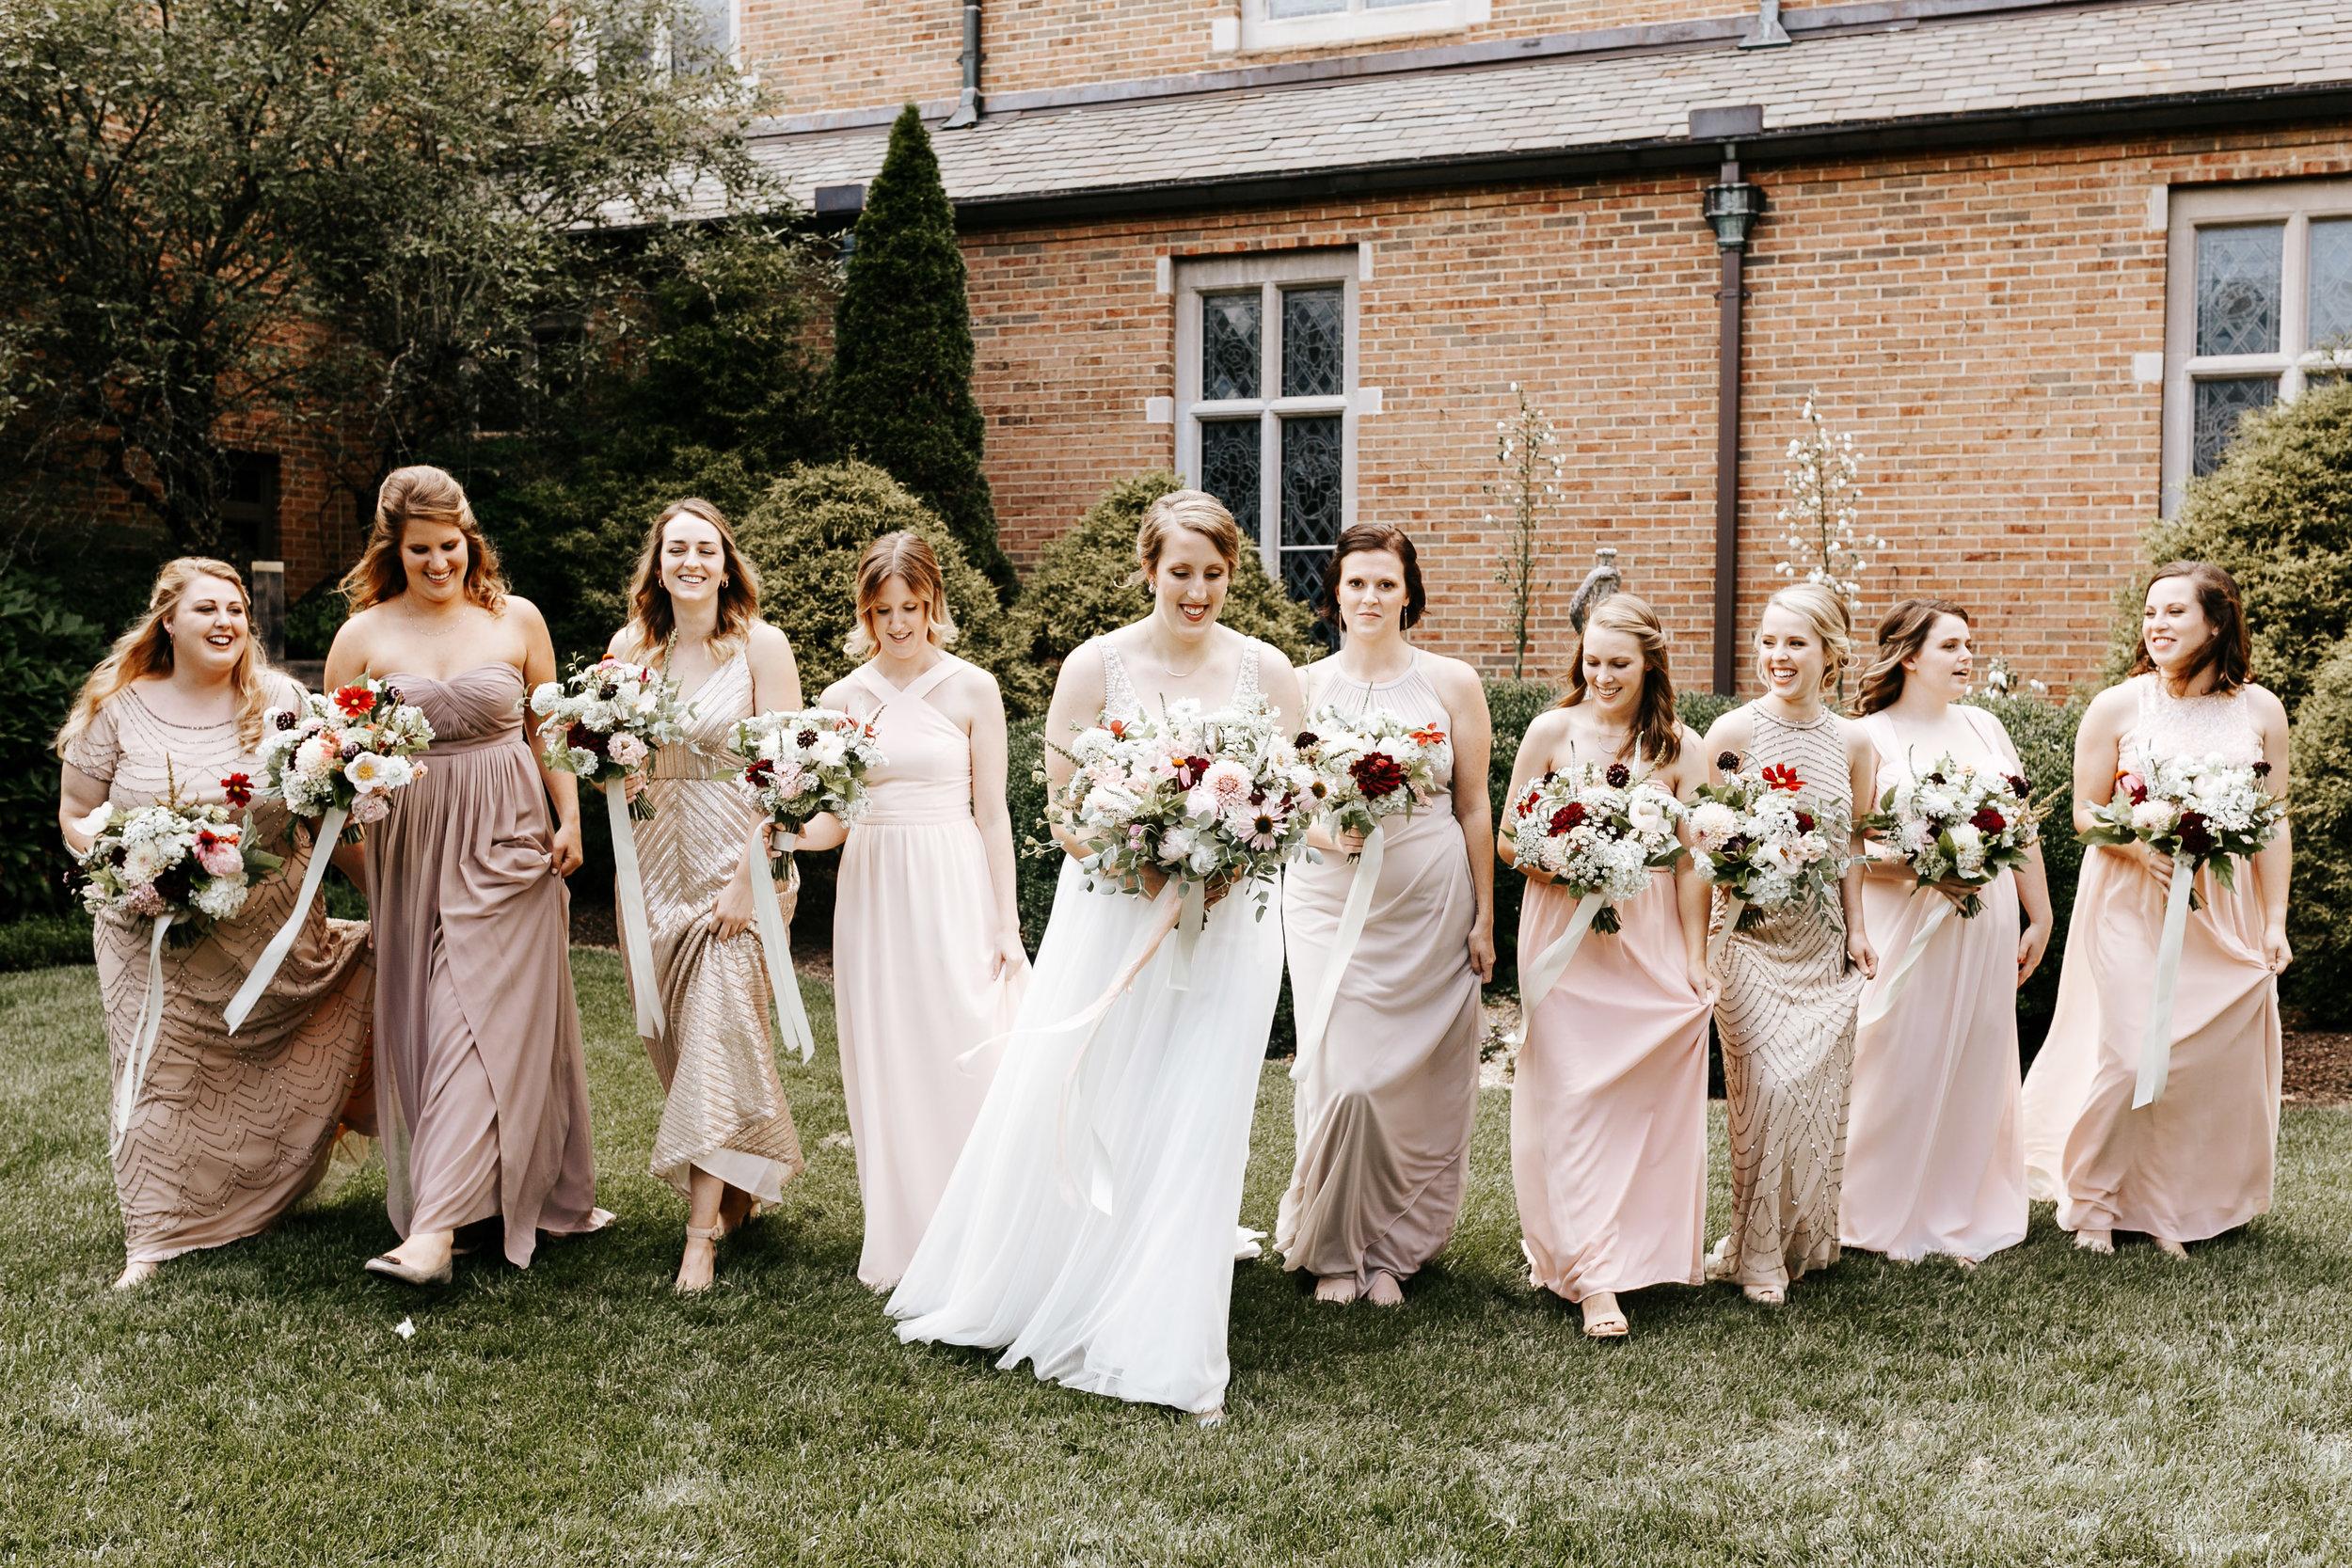 bohemian-photographer-wedding-tennessee-14.jpg